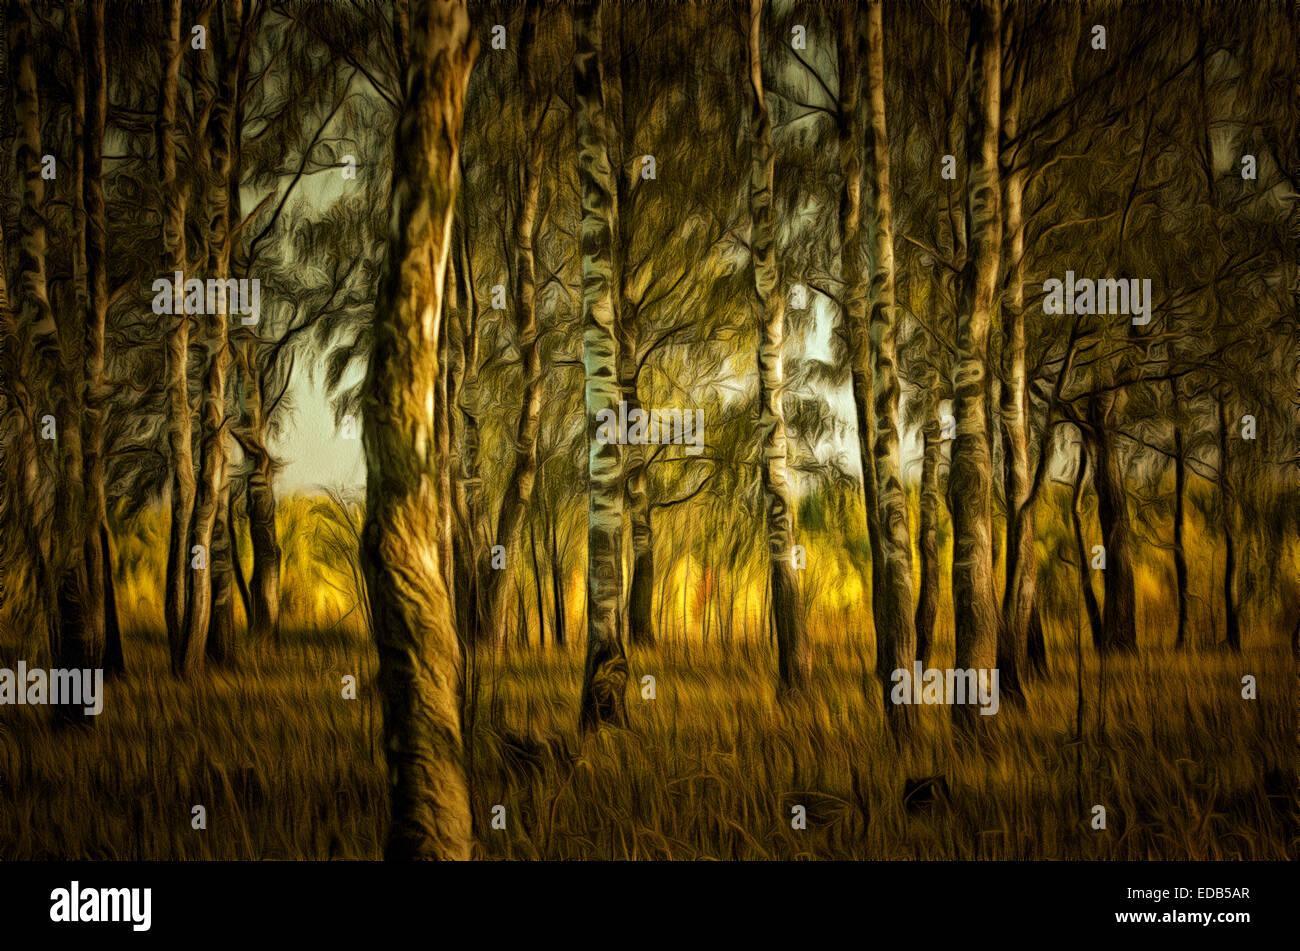 Birch (Lat. Bétula) - genus of deciduous trees and shrubs birch family (Betulaceae), birch grove - Stock Image